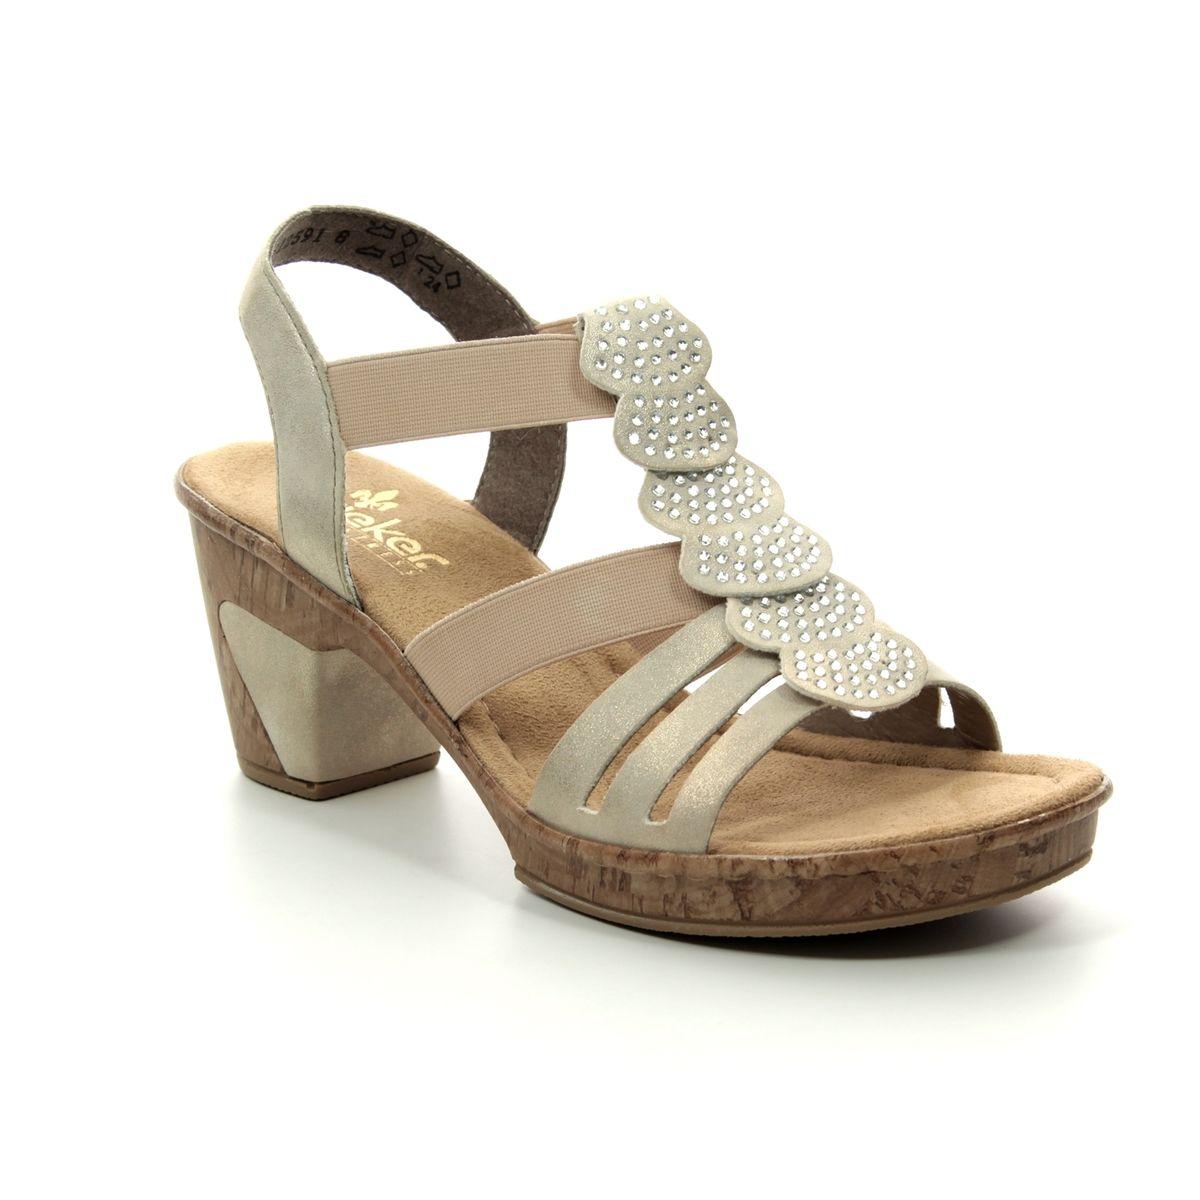 399d8f312b0f7 Rieker Heeled Sandals - Gold - 69702-60 ROBRUFFLE